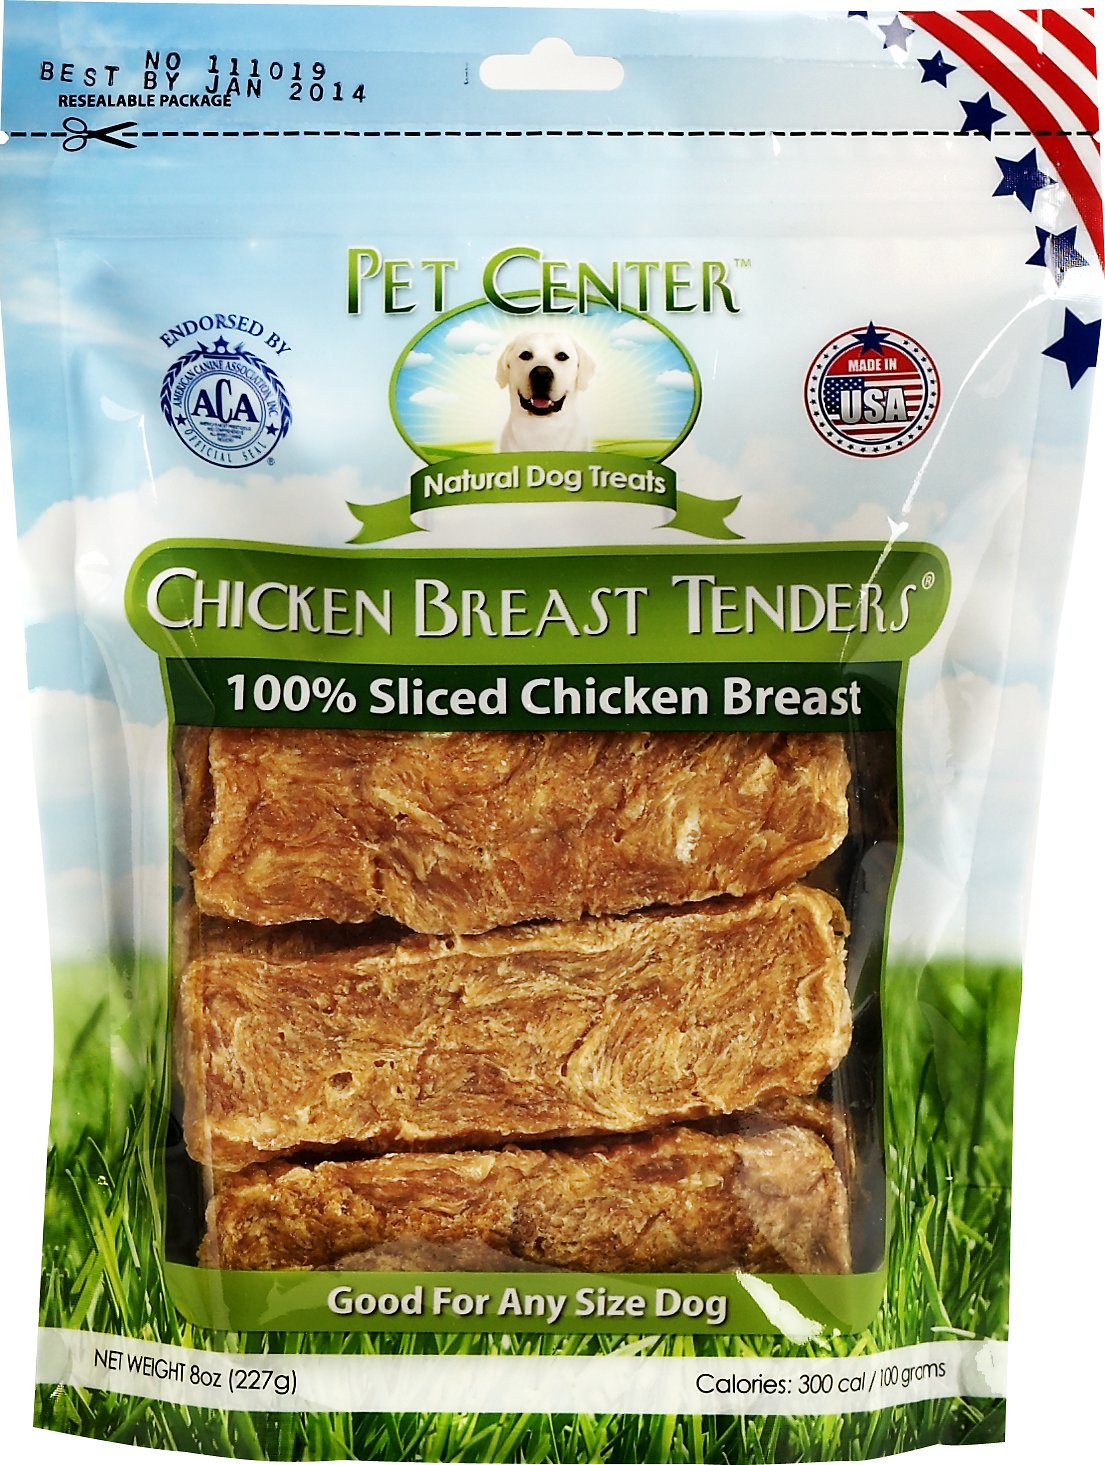 Pet Center Sliced Chicken Breast Tenders Dog Treats, 8-oz bag Image